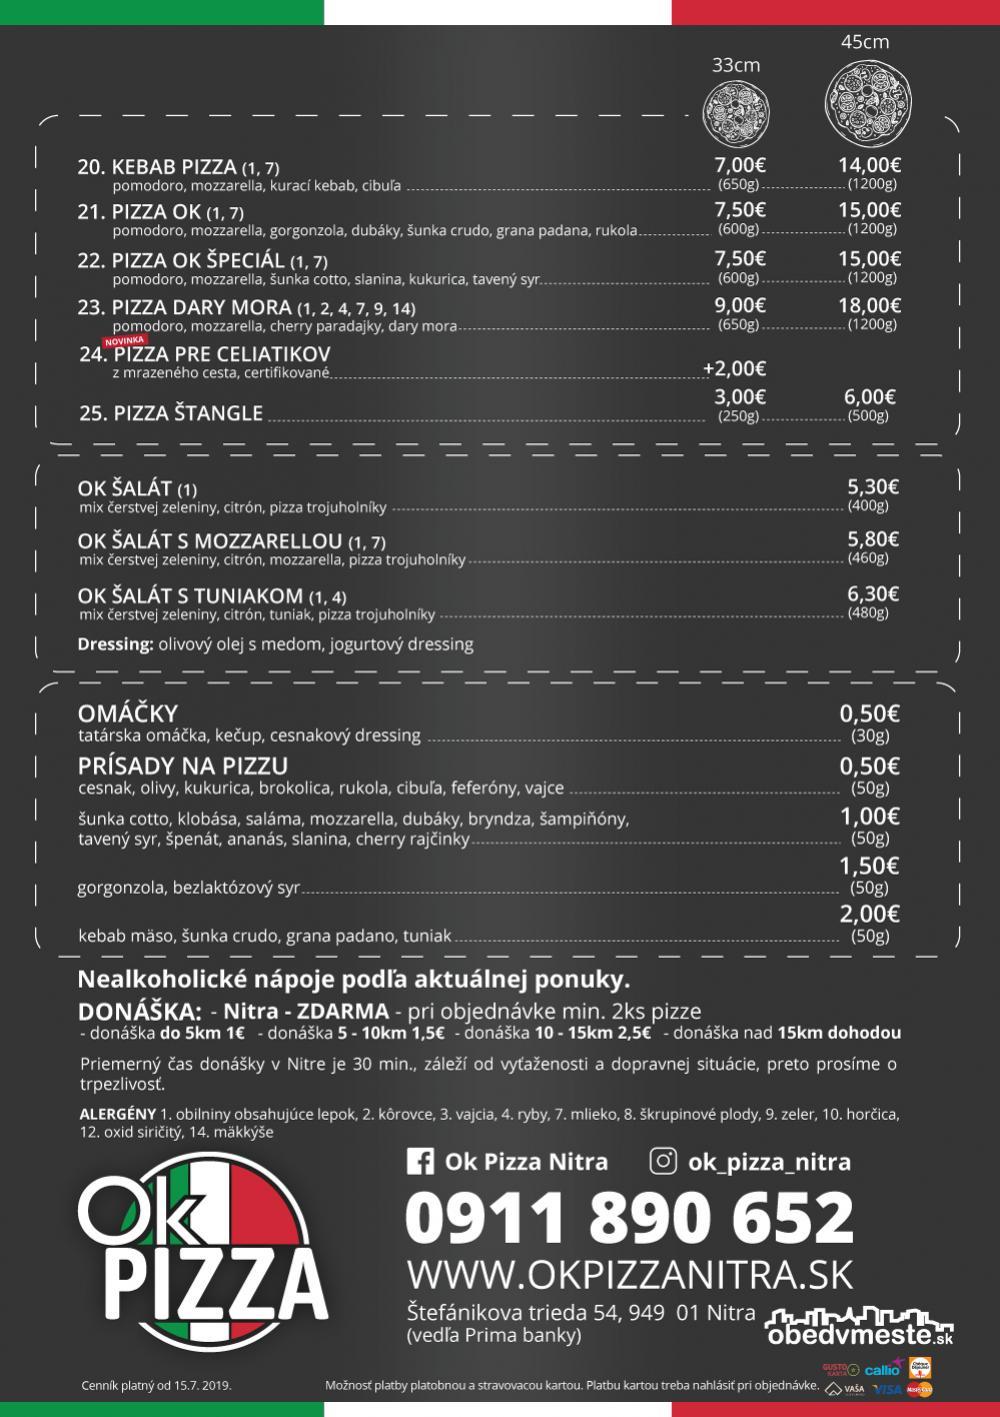 ponuka OK pizza objednavky telefonicky prava talianska pizza